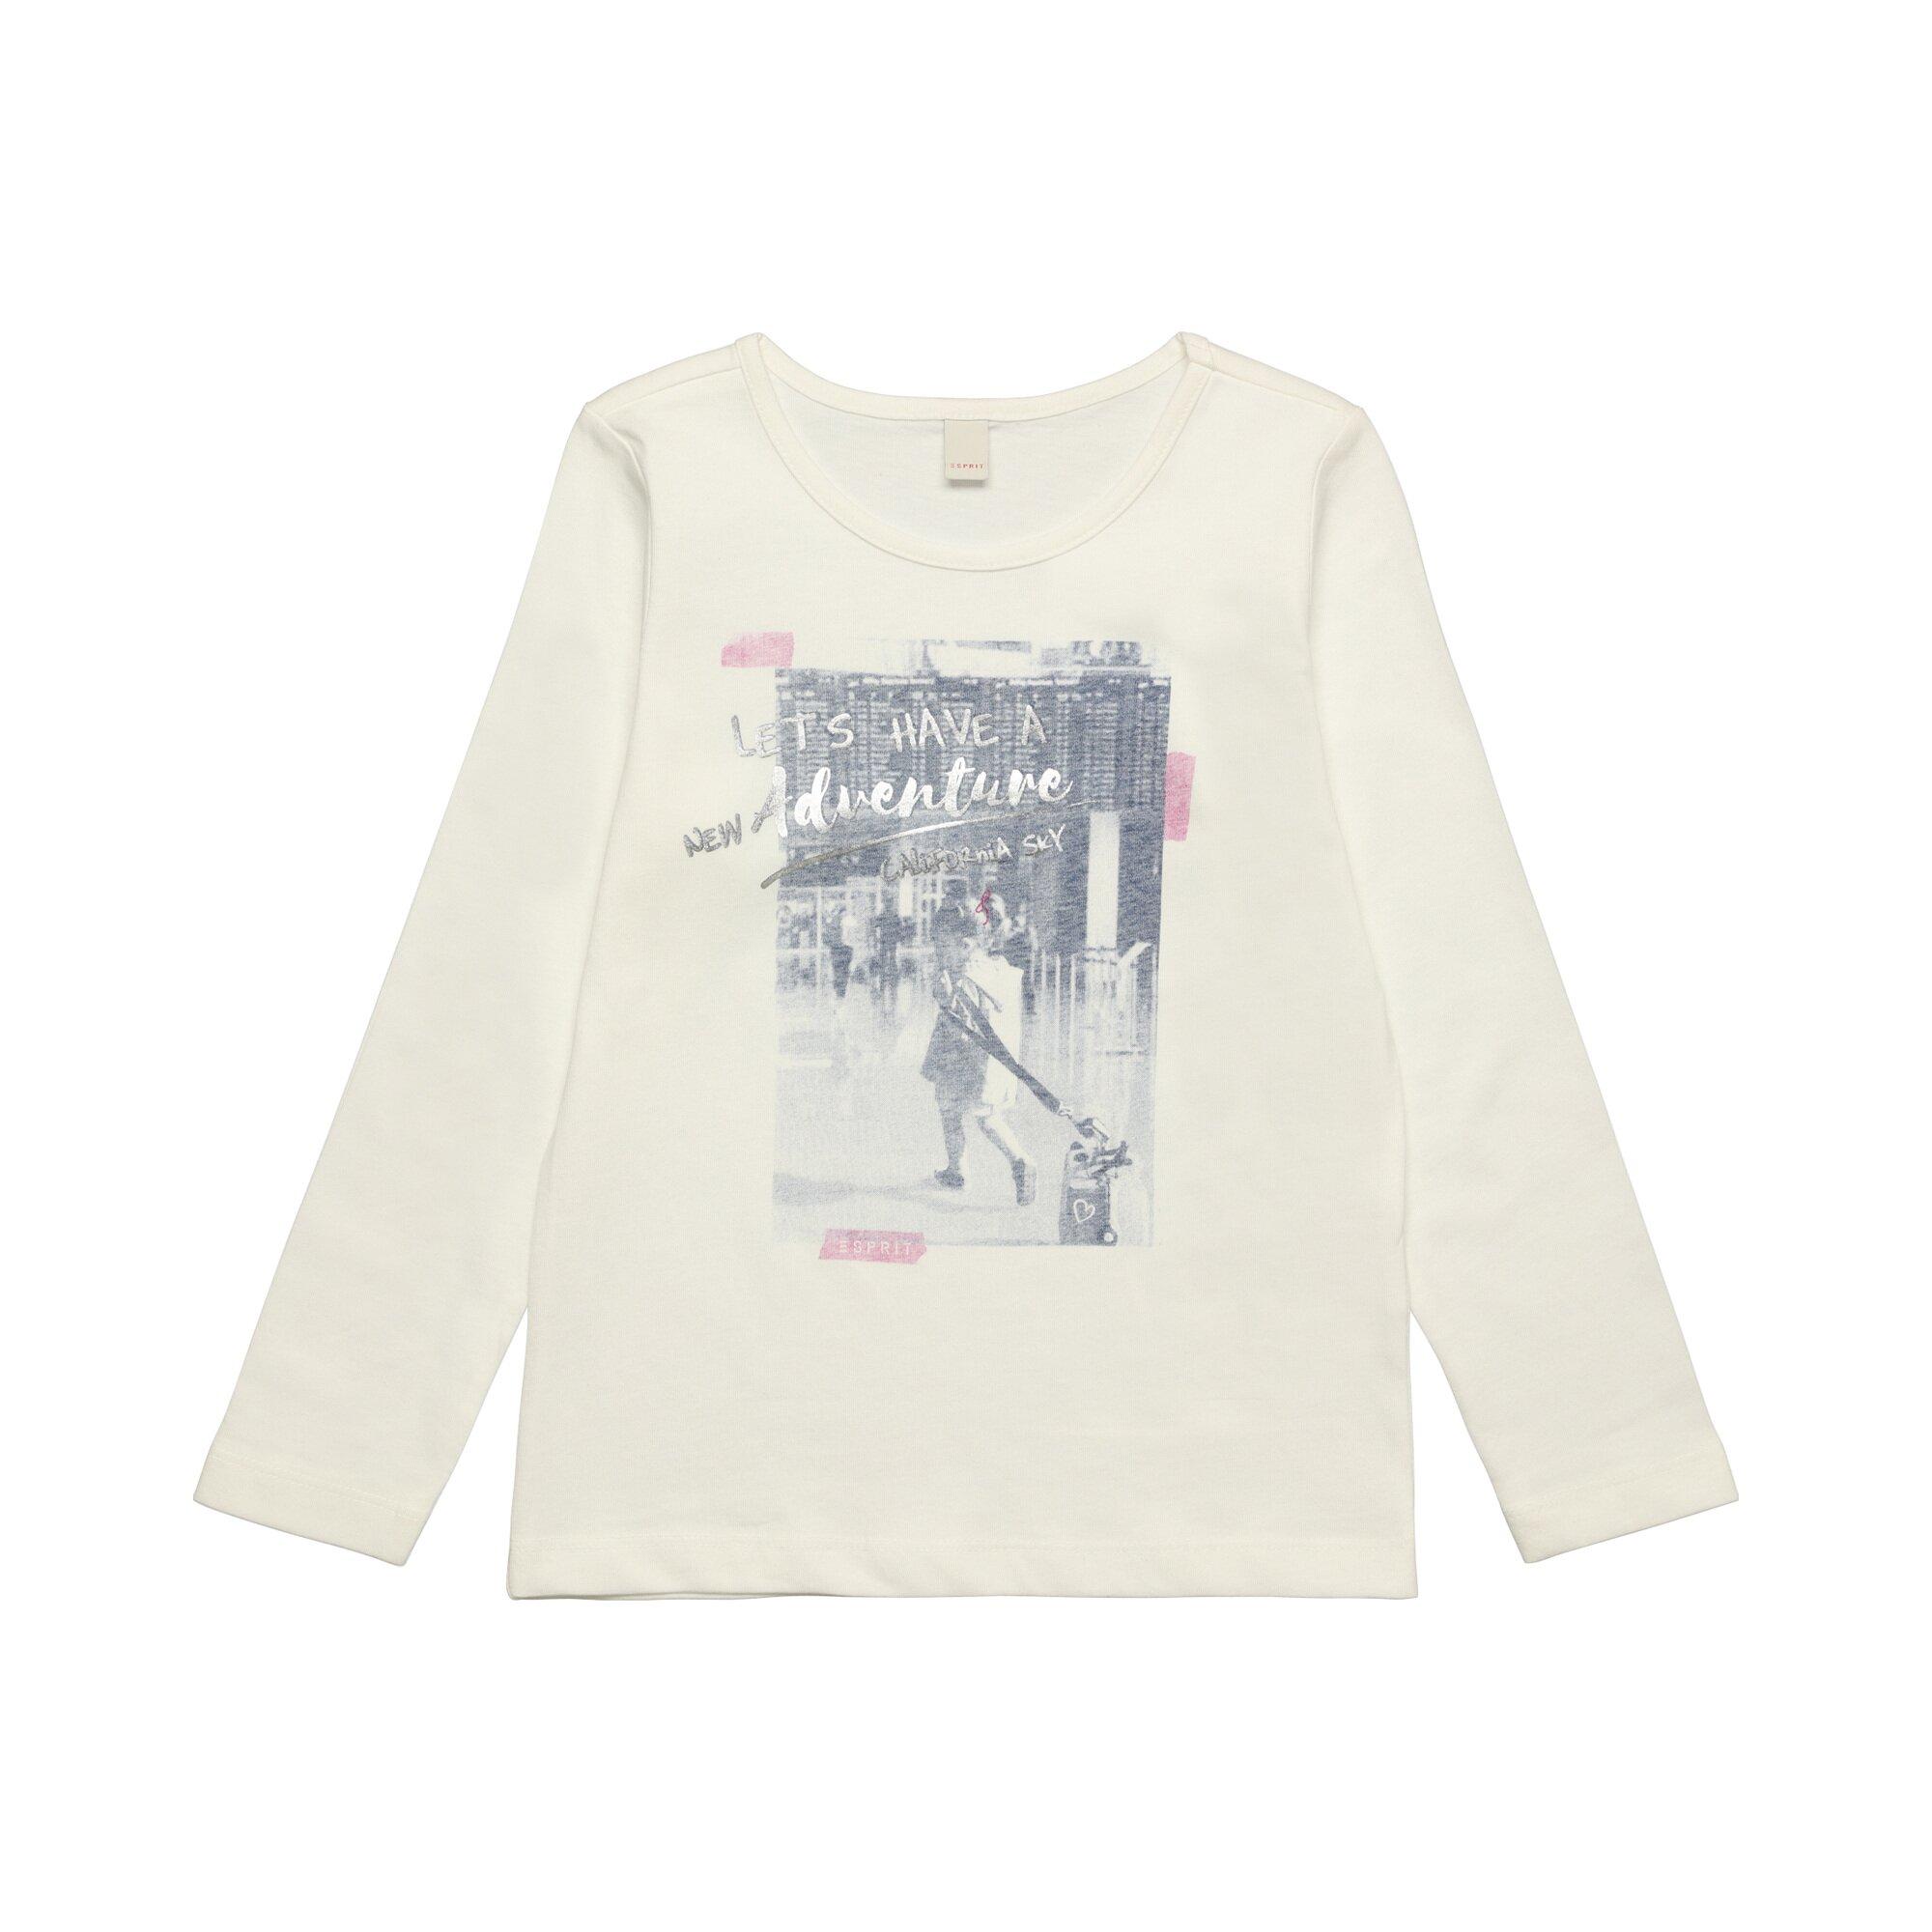 Esprit Shirt langarm A new adventure